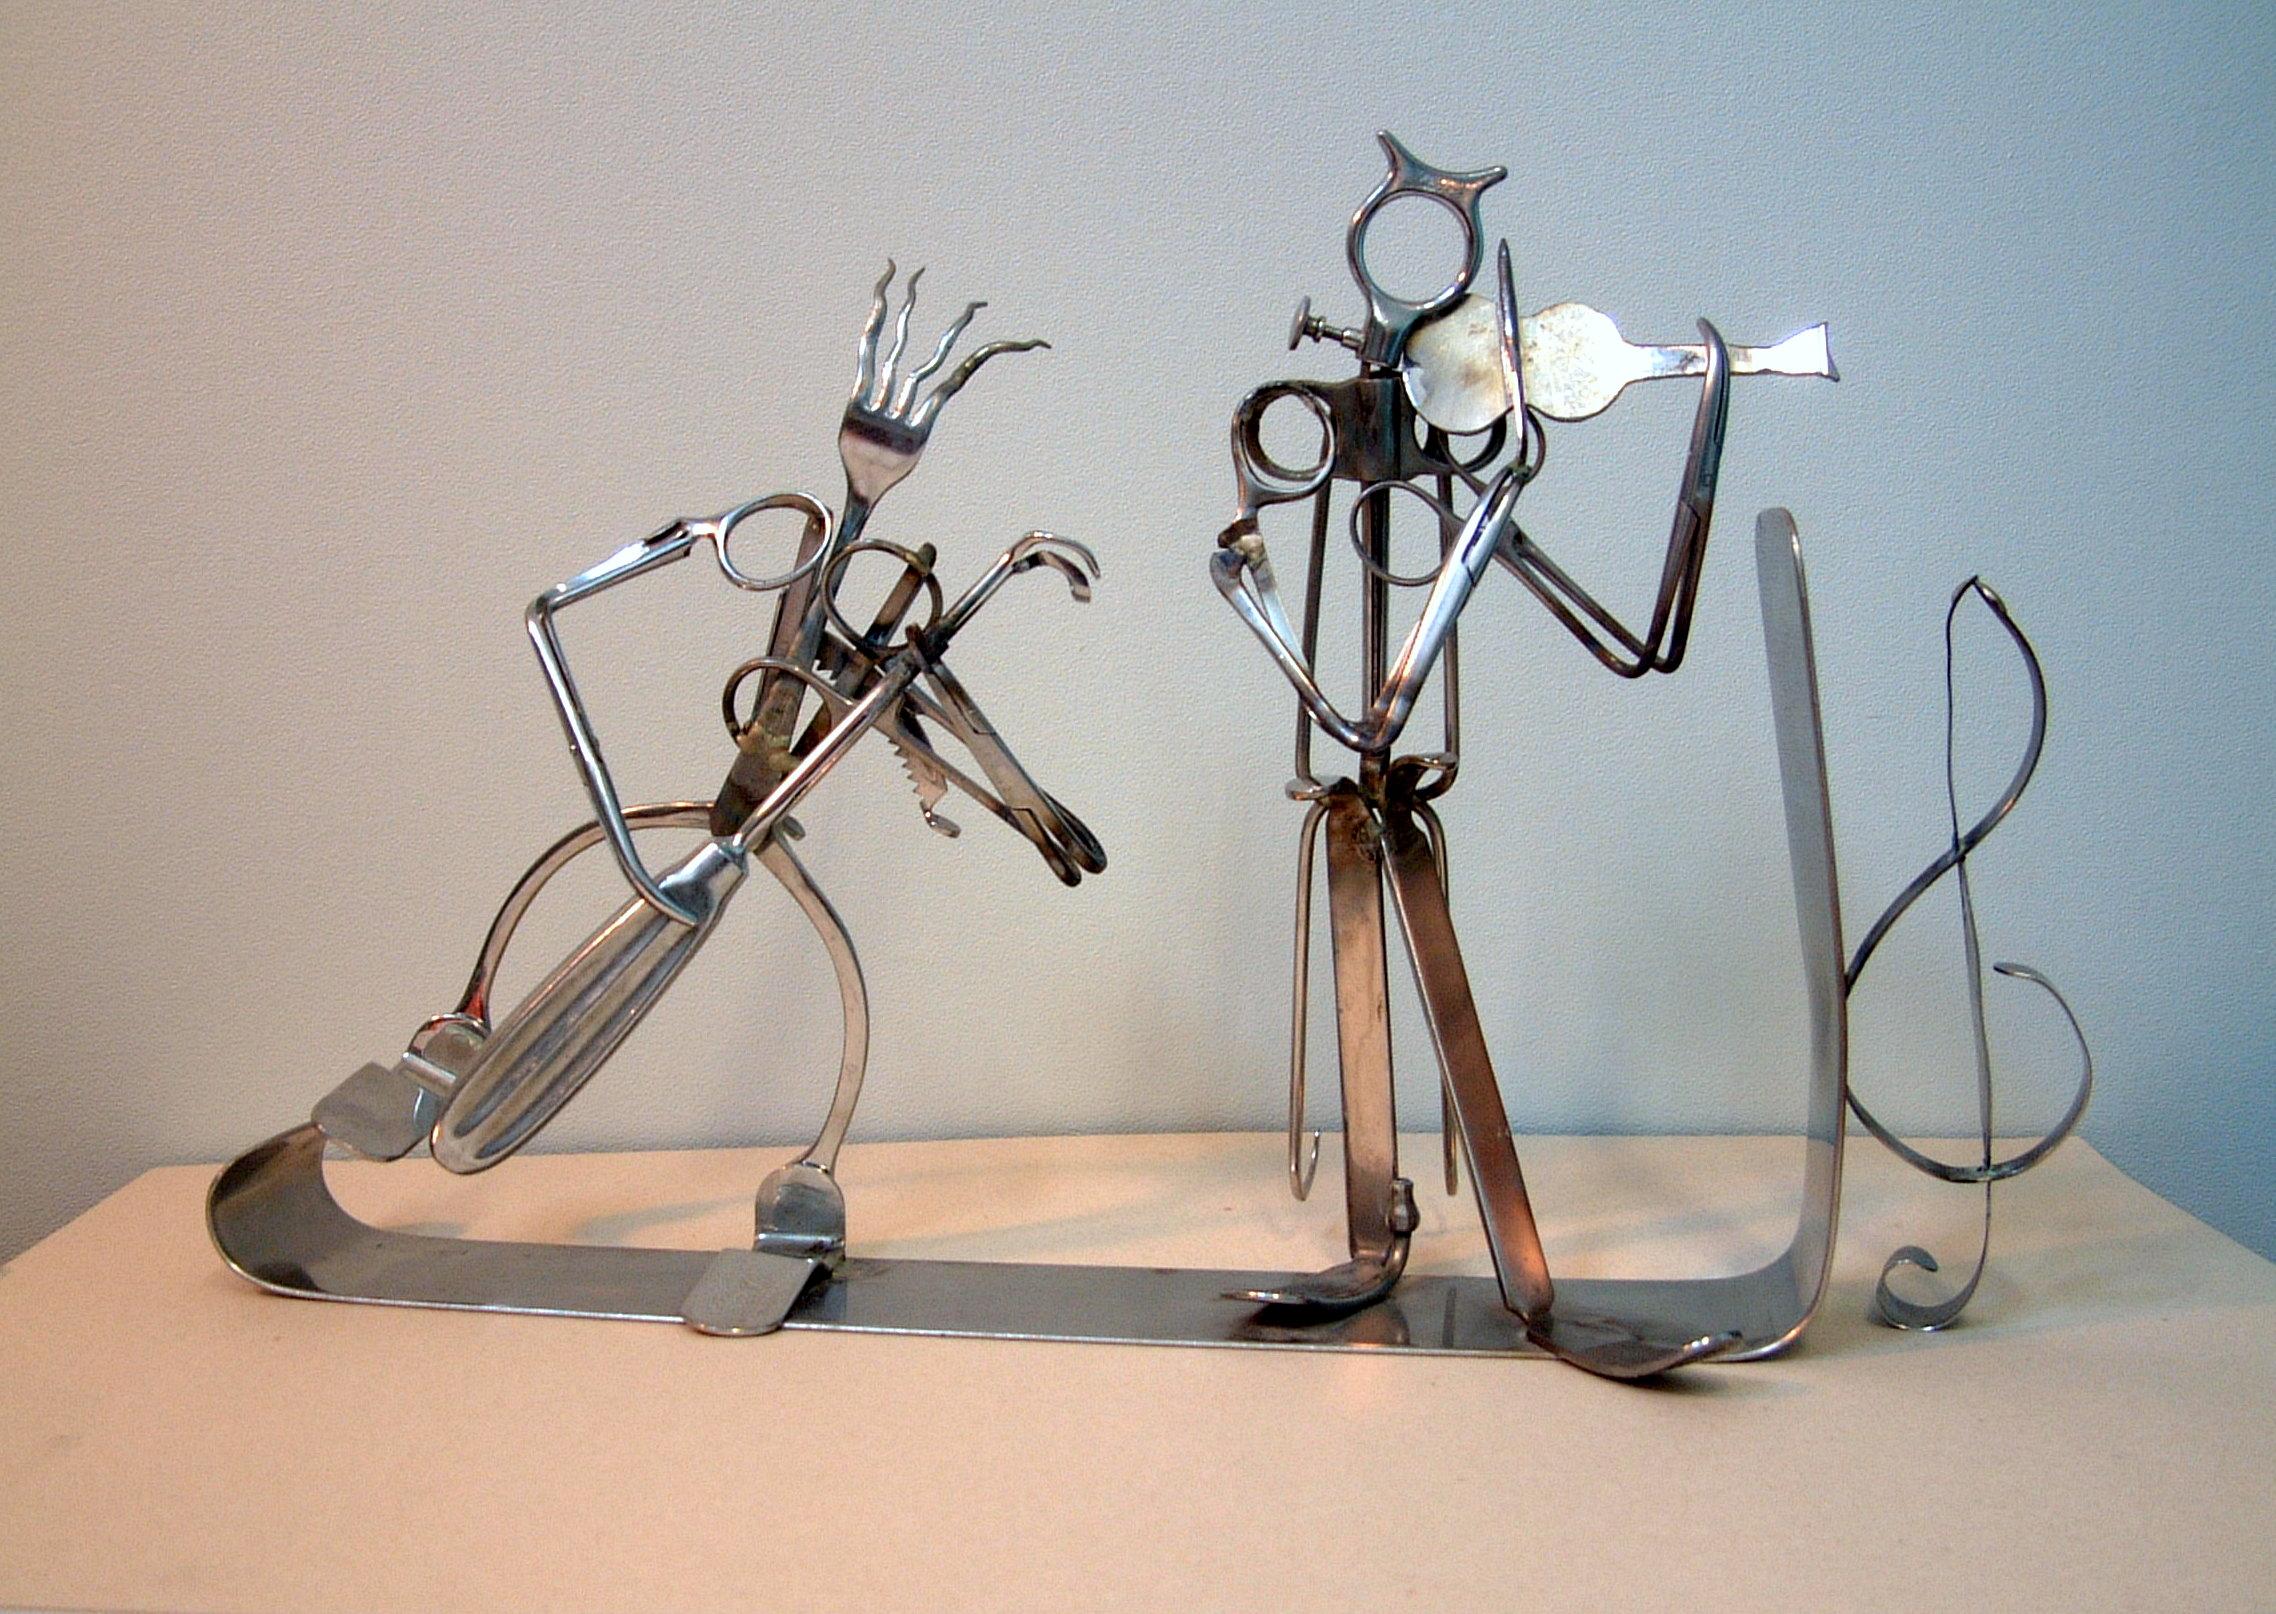 Medical musicians